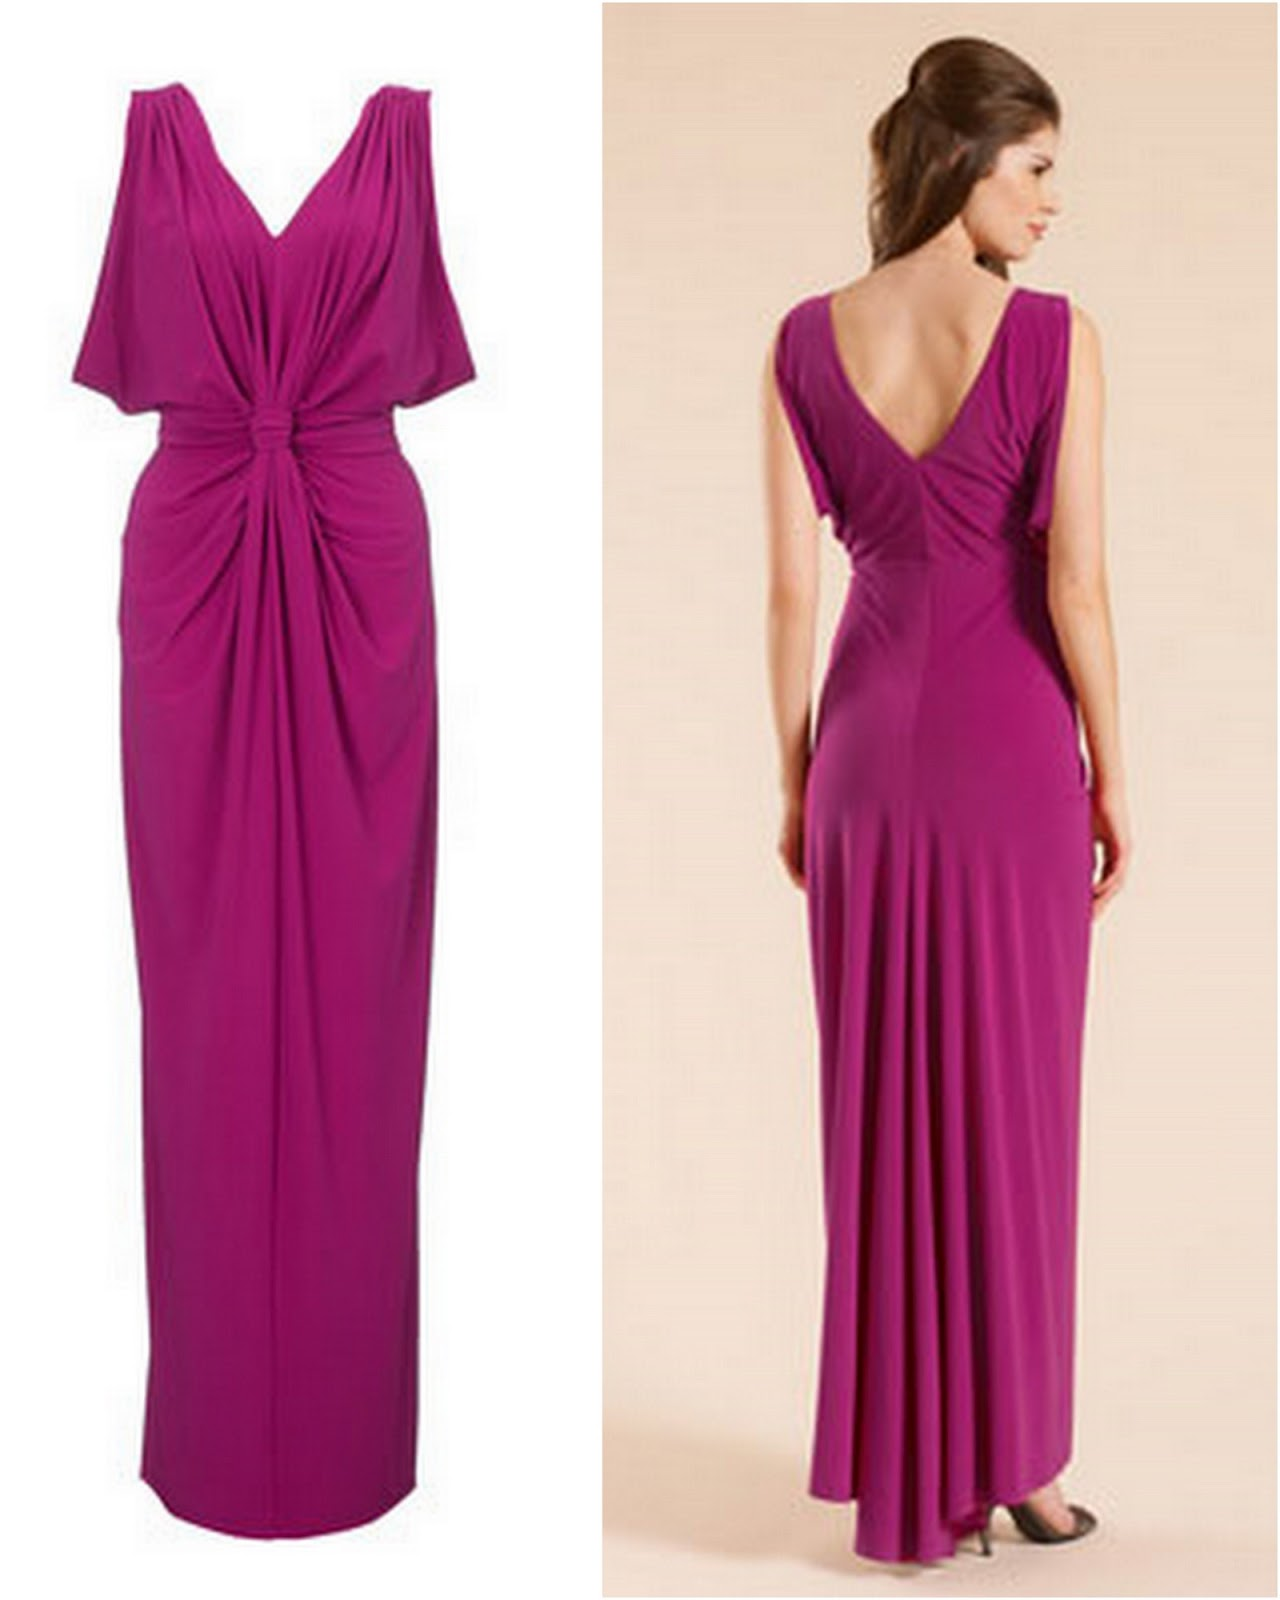 Ball Dresses: The Bay Evening Dresses